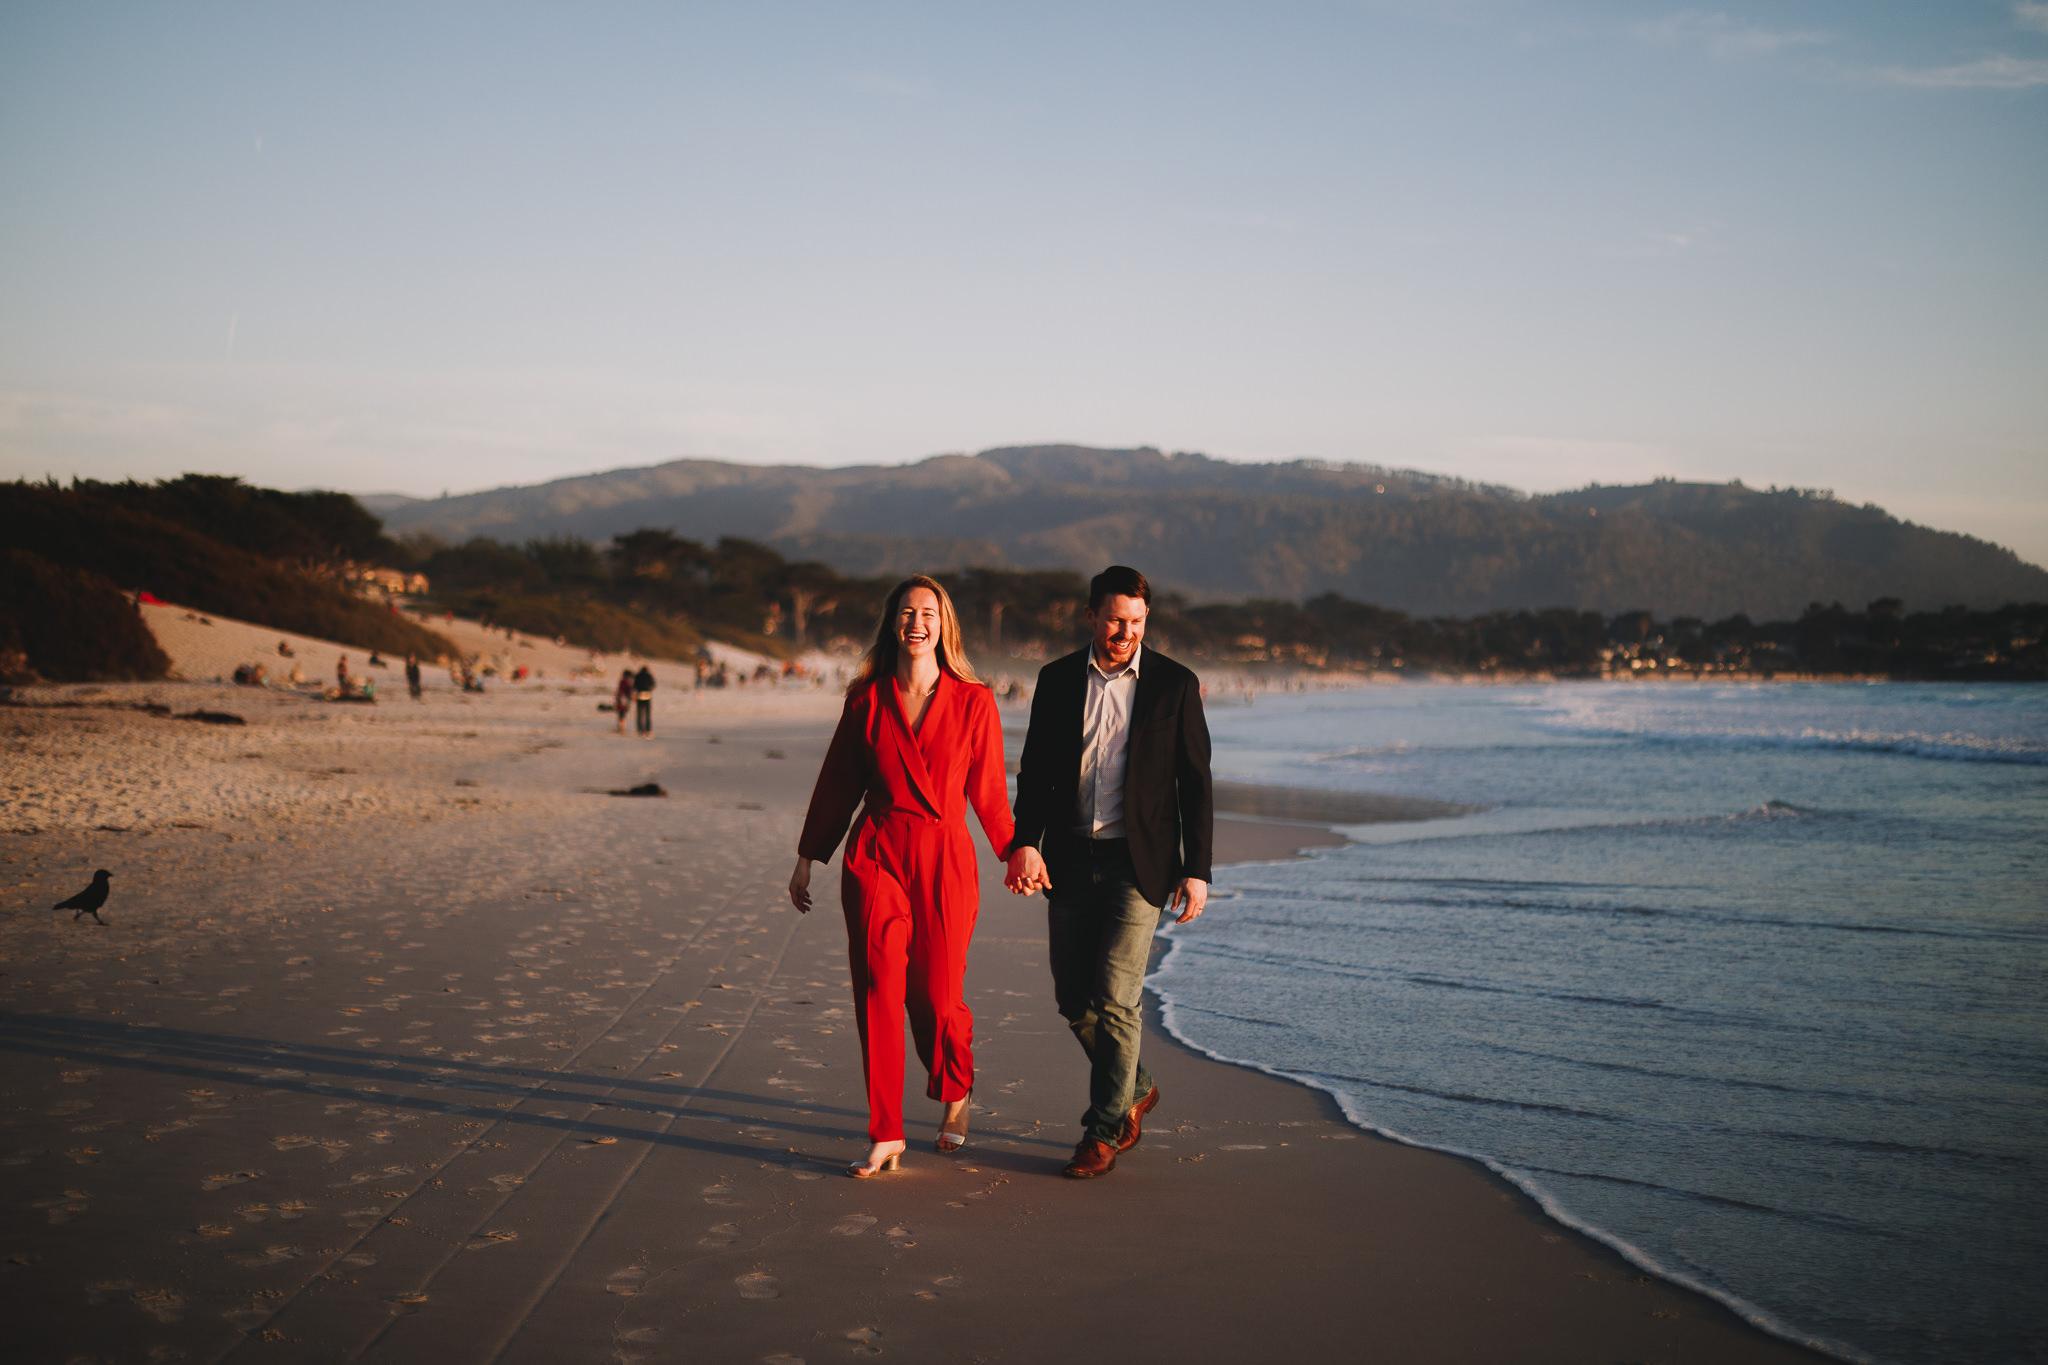 Archer Inspired Photography Carmel Beach California Wedding Engagement Lifestyle Anniversary Natural Light Photographer-37.jpg